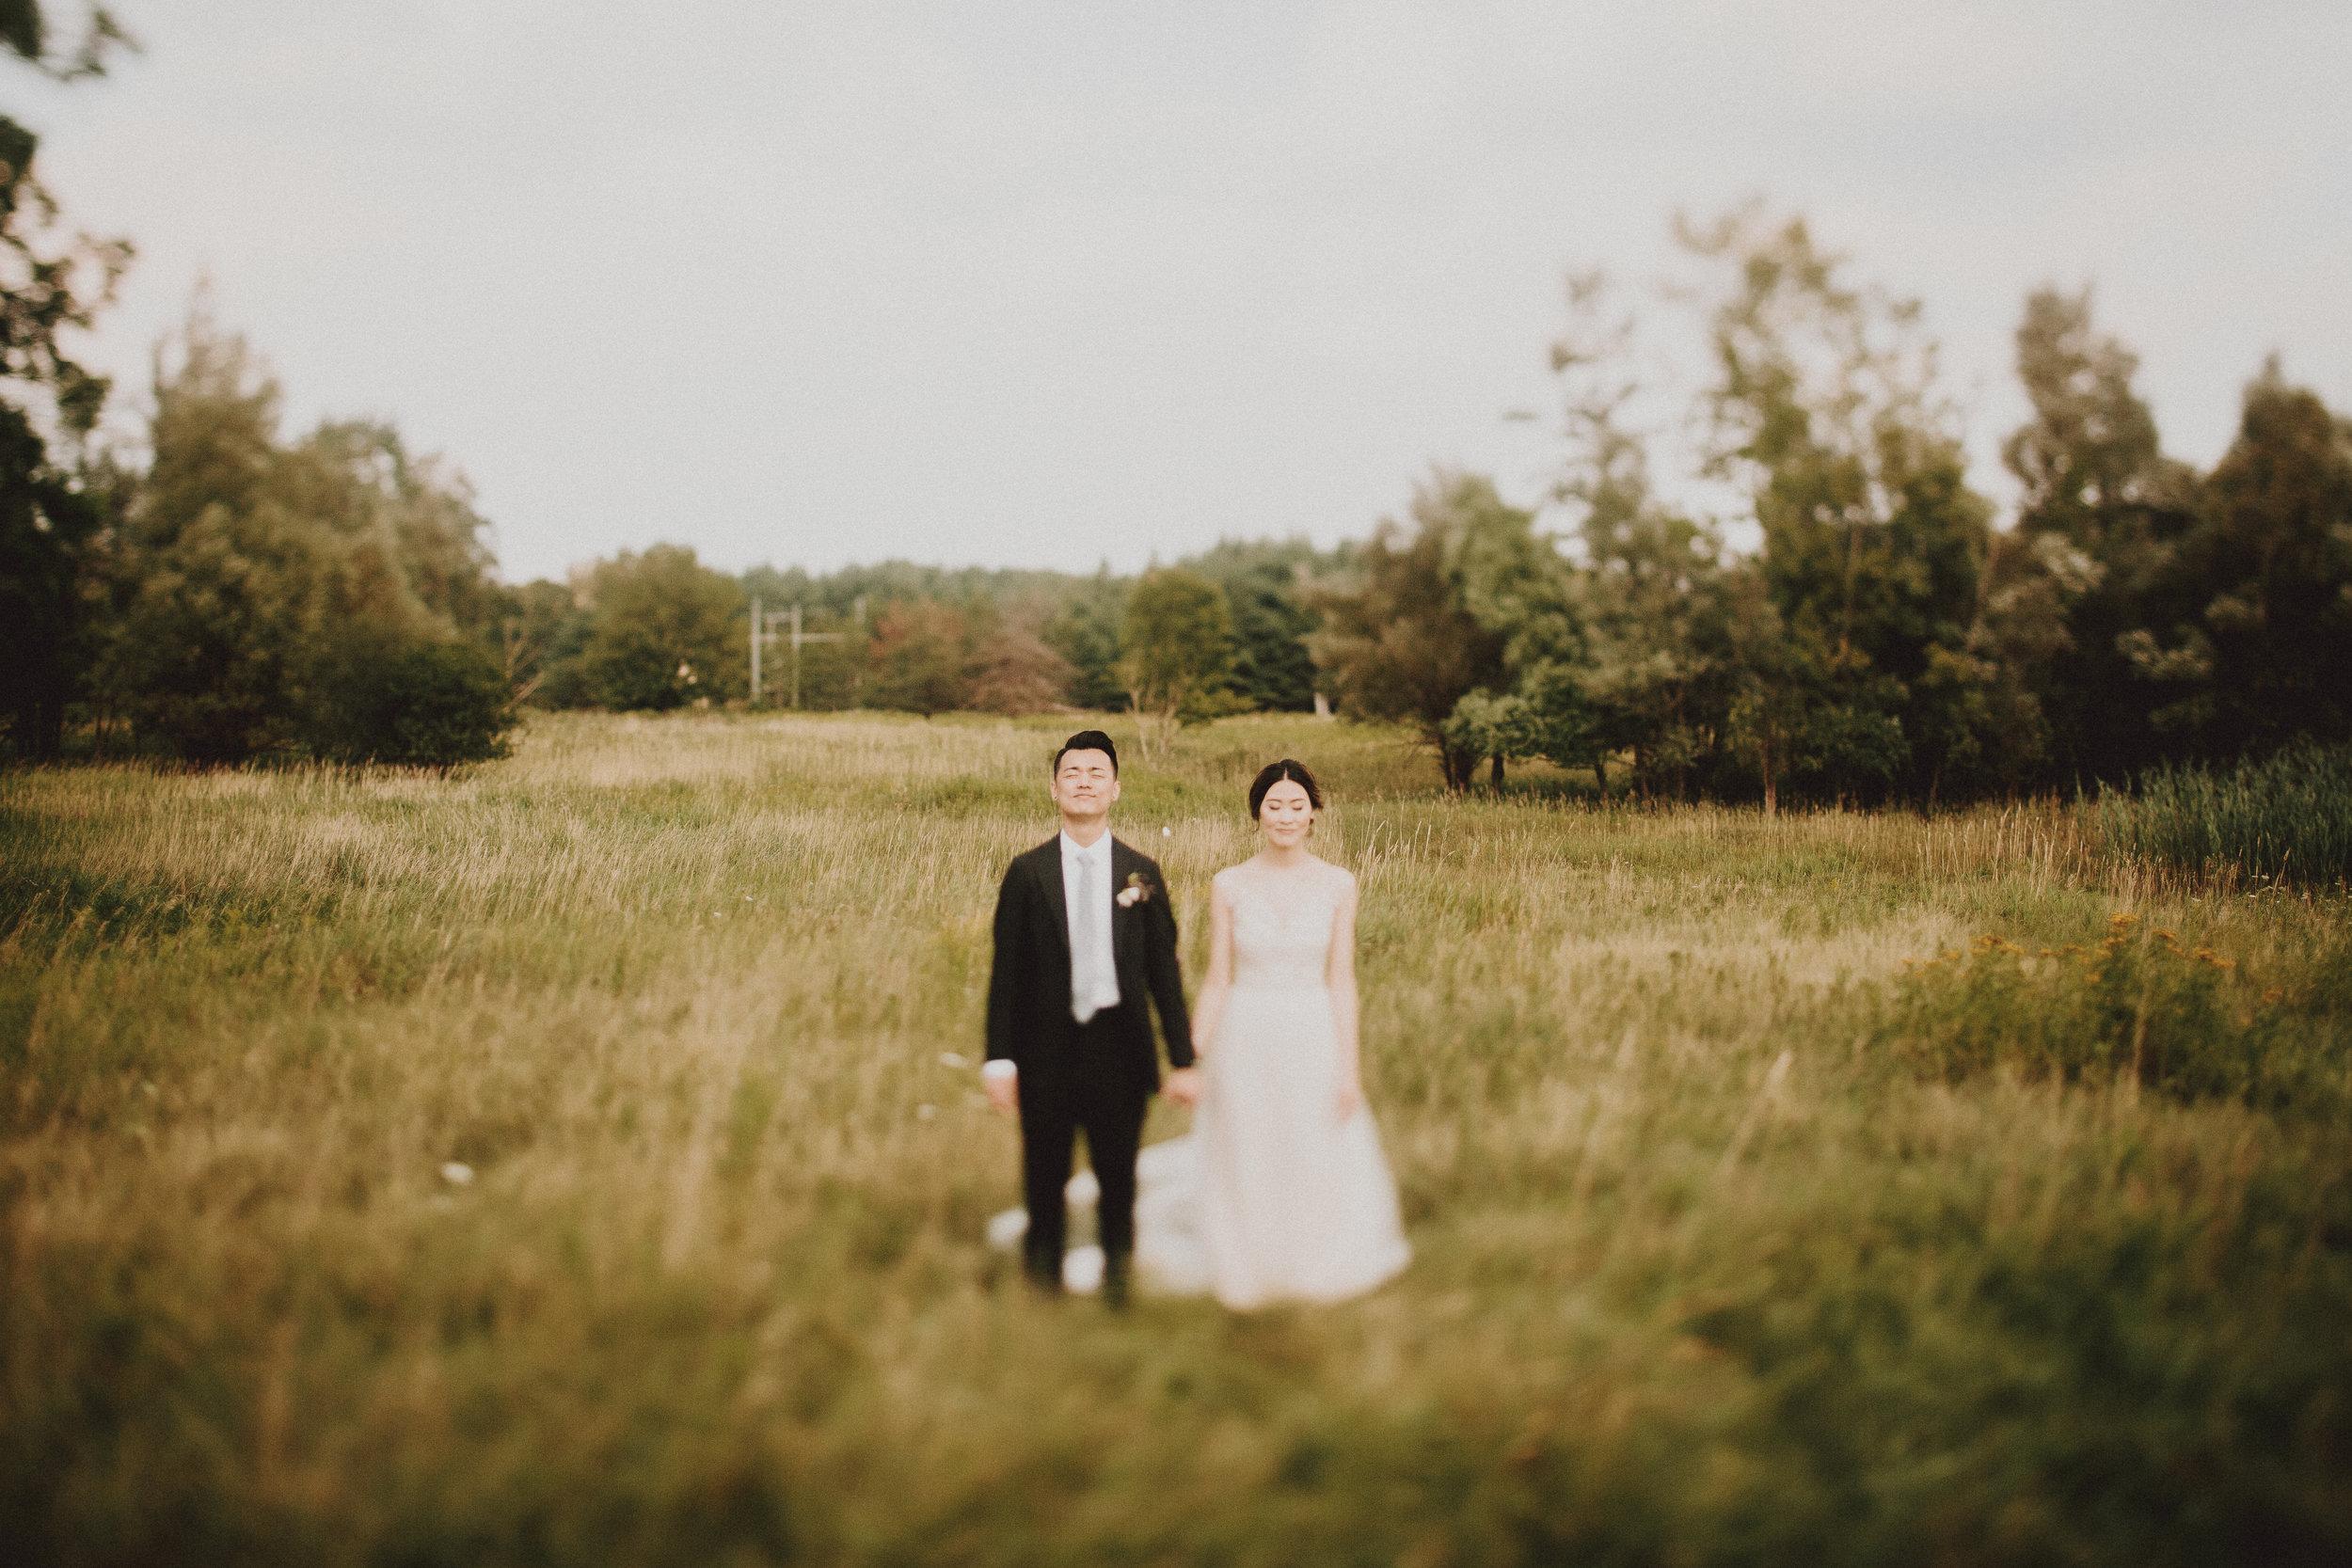 WeddingAlbumEdits-23.jpg